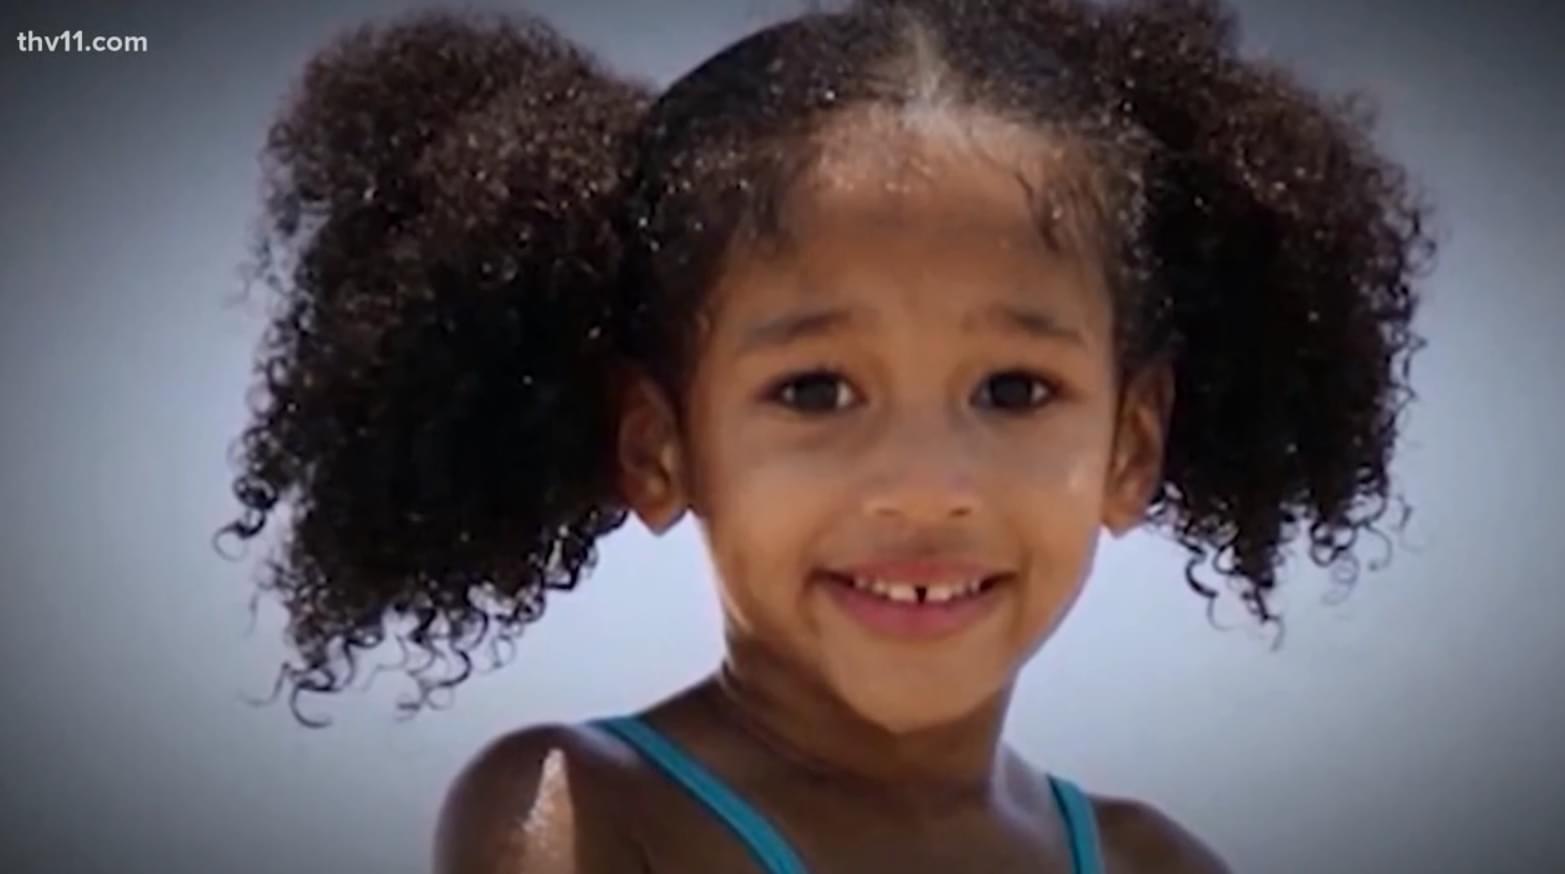 Bridge in Arkansas Renamed in Honor of Slain Houston Girl